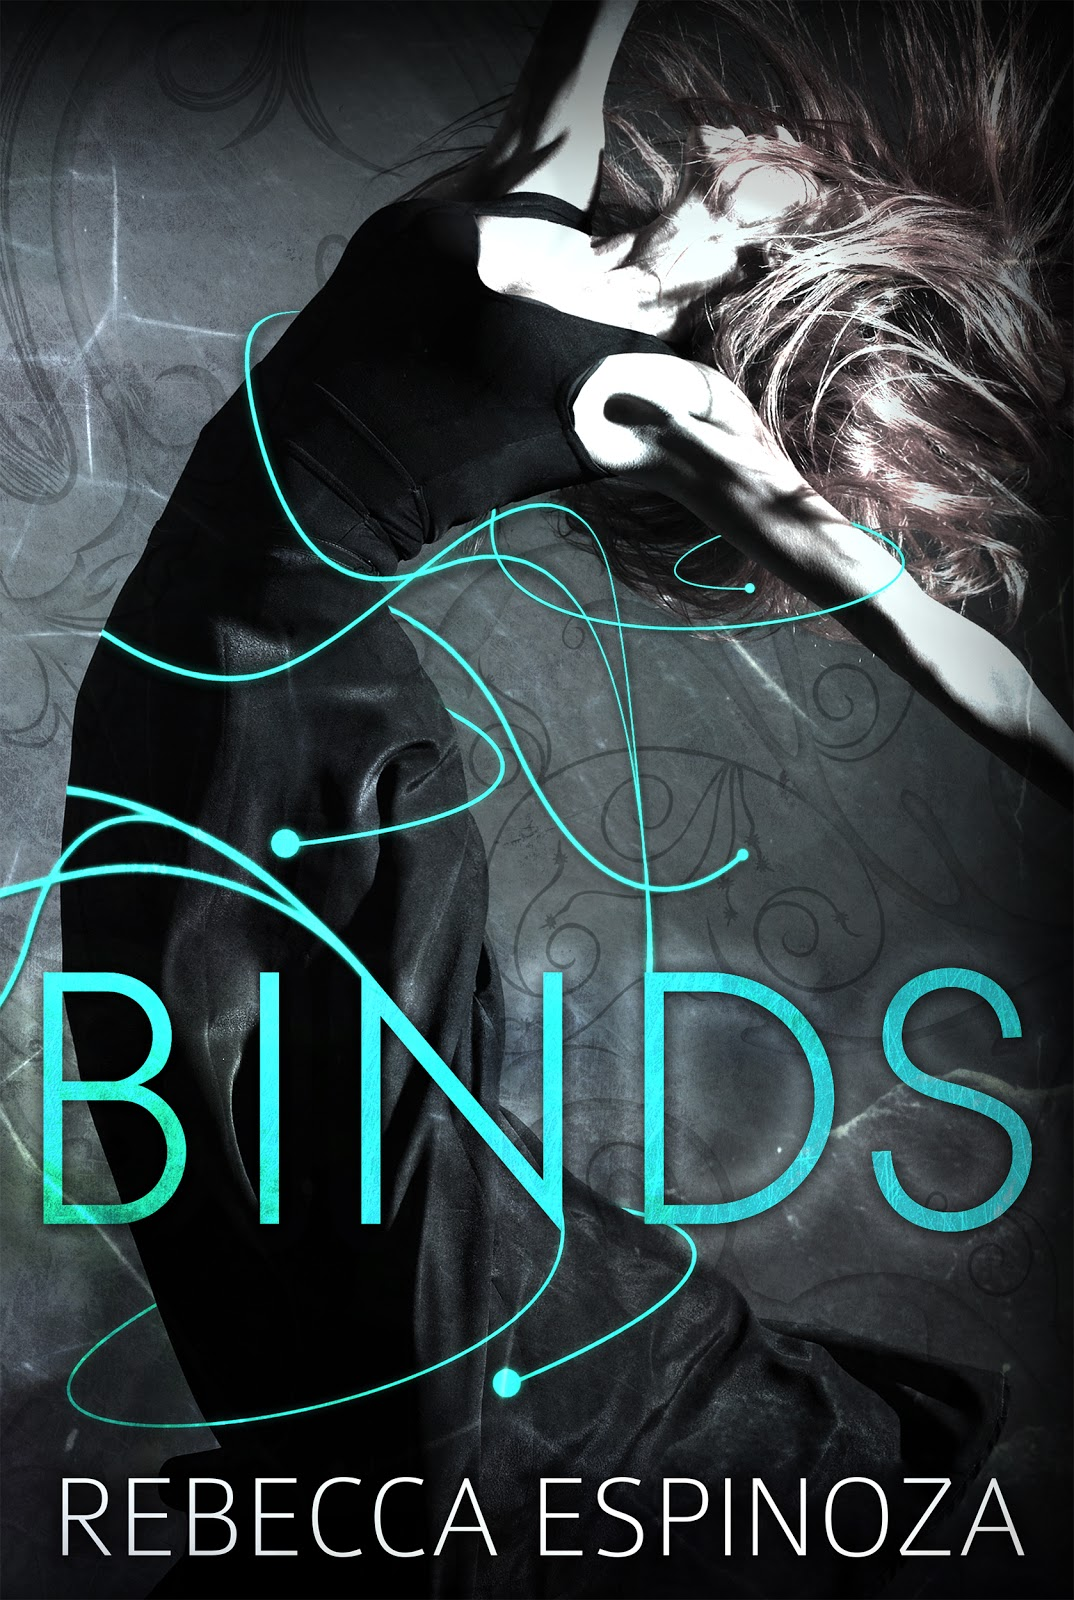 Binds